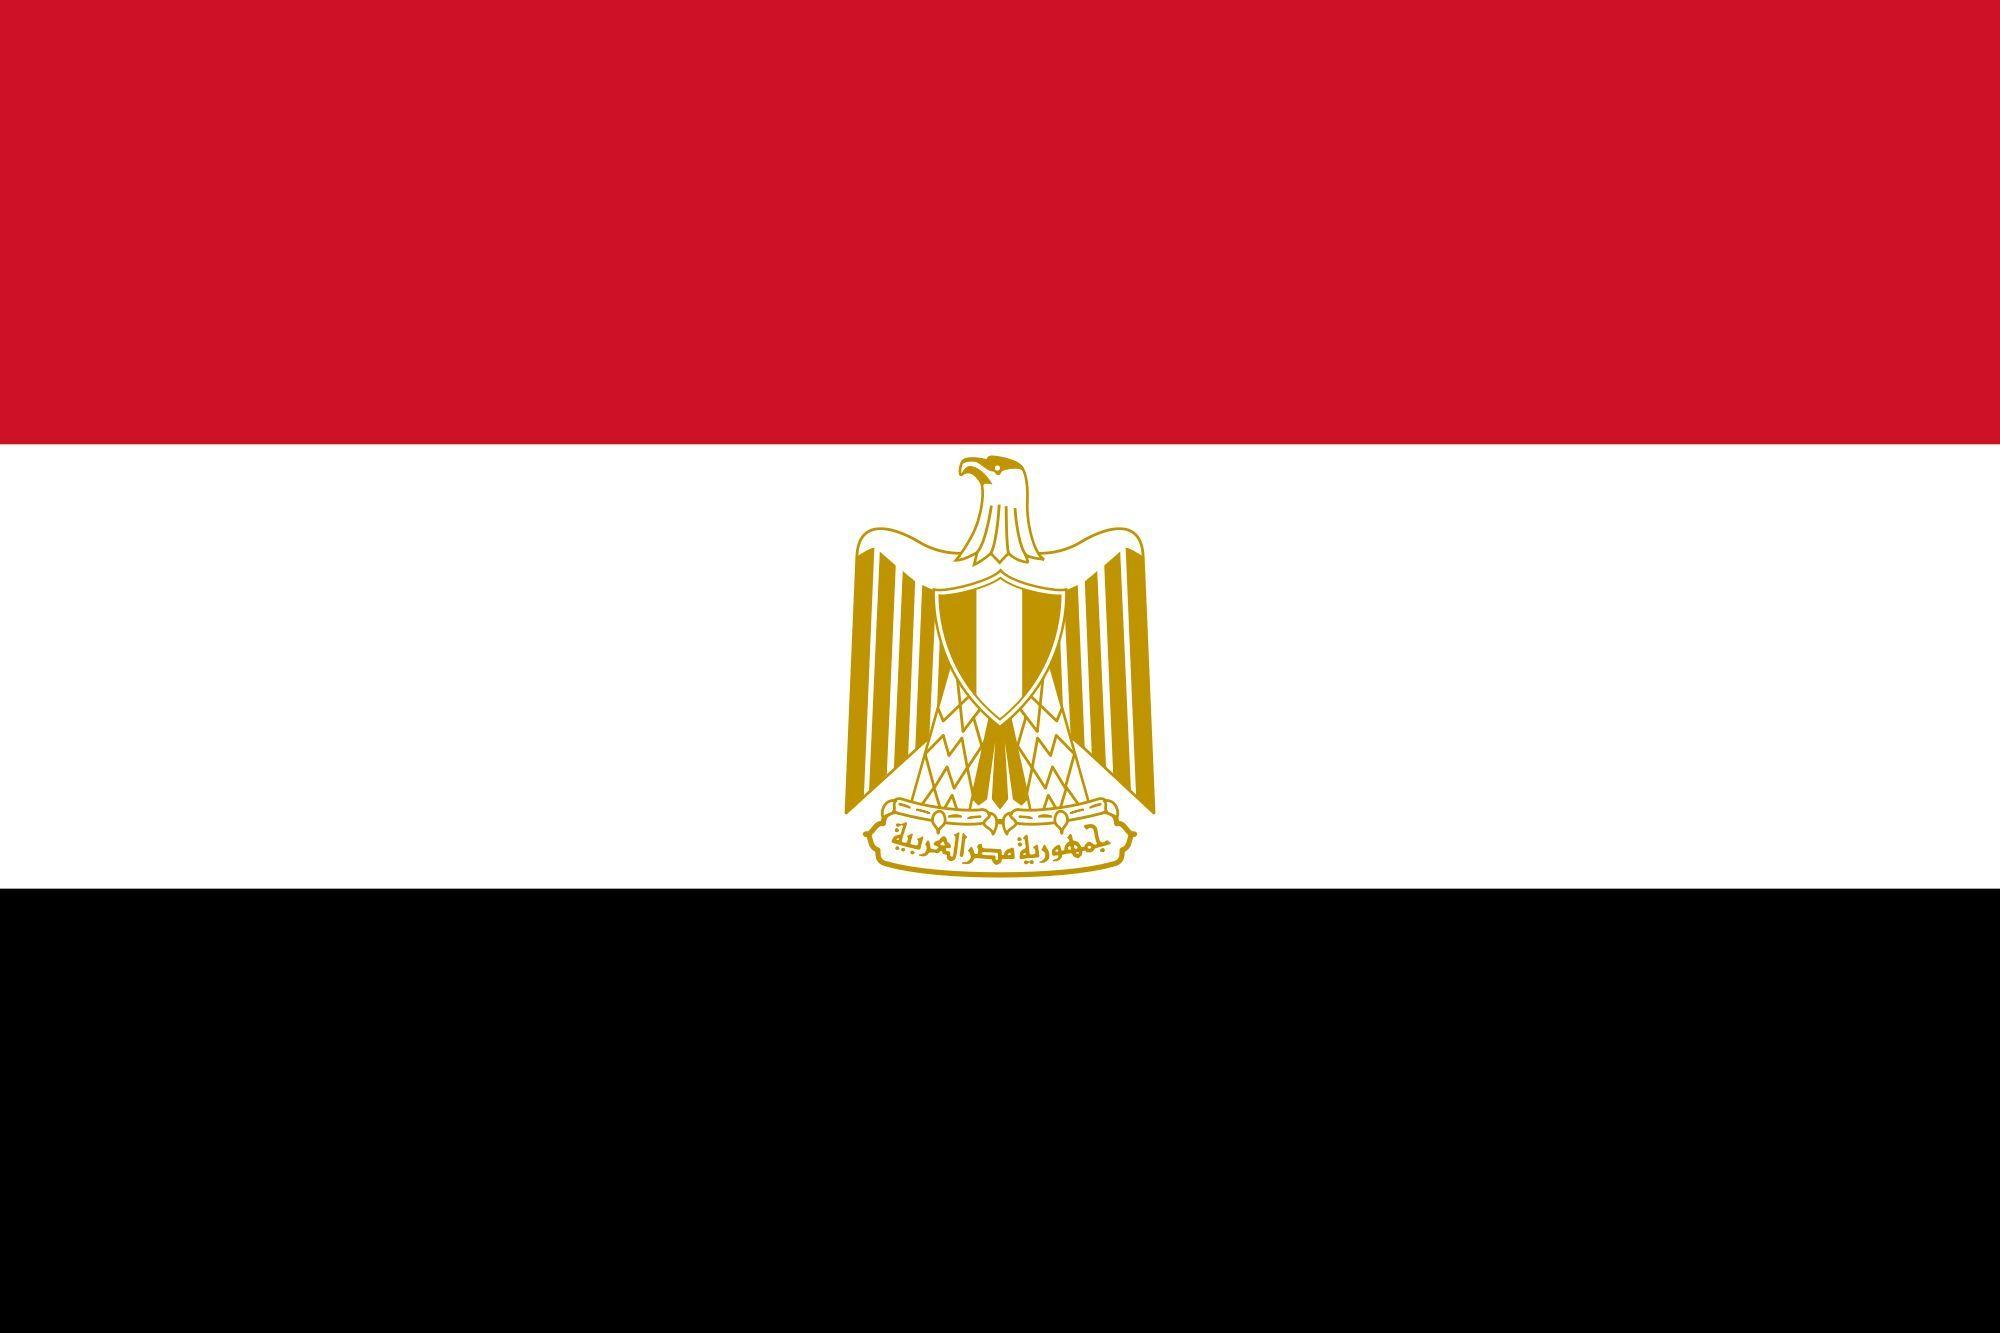 Egypt Country Flag Egyptian Flag Egypt Flag Egypt Country